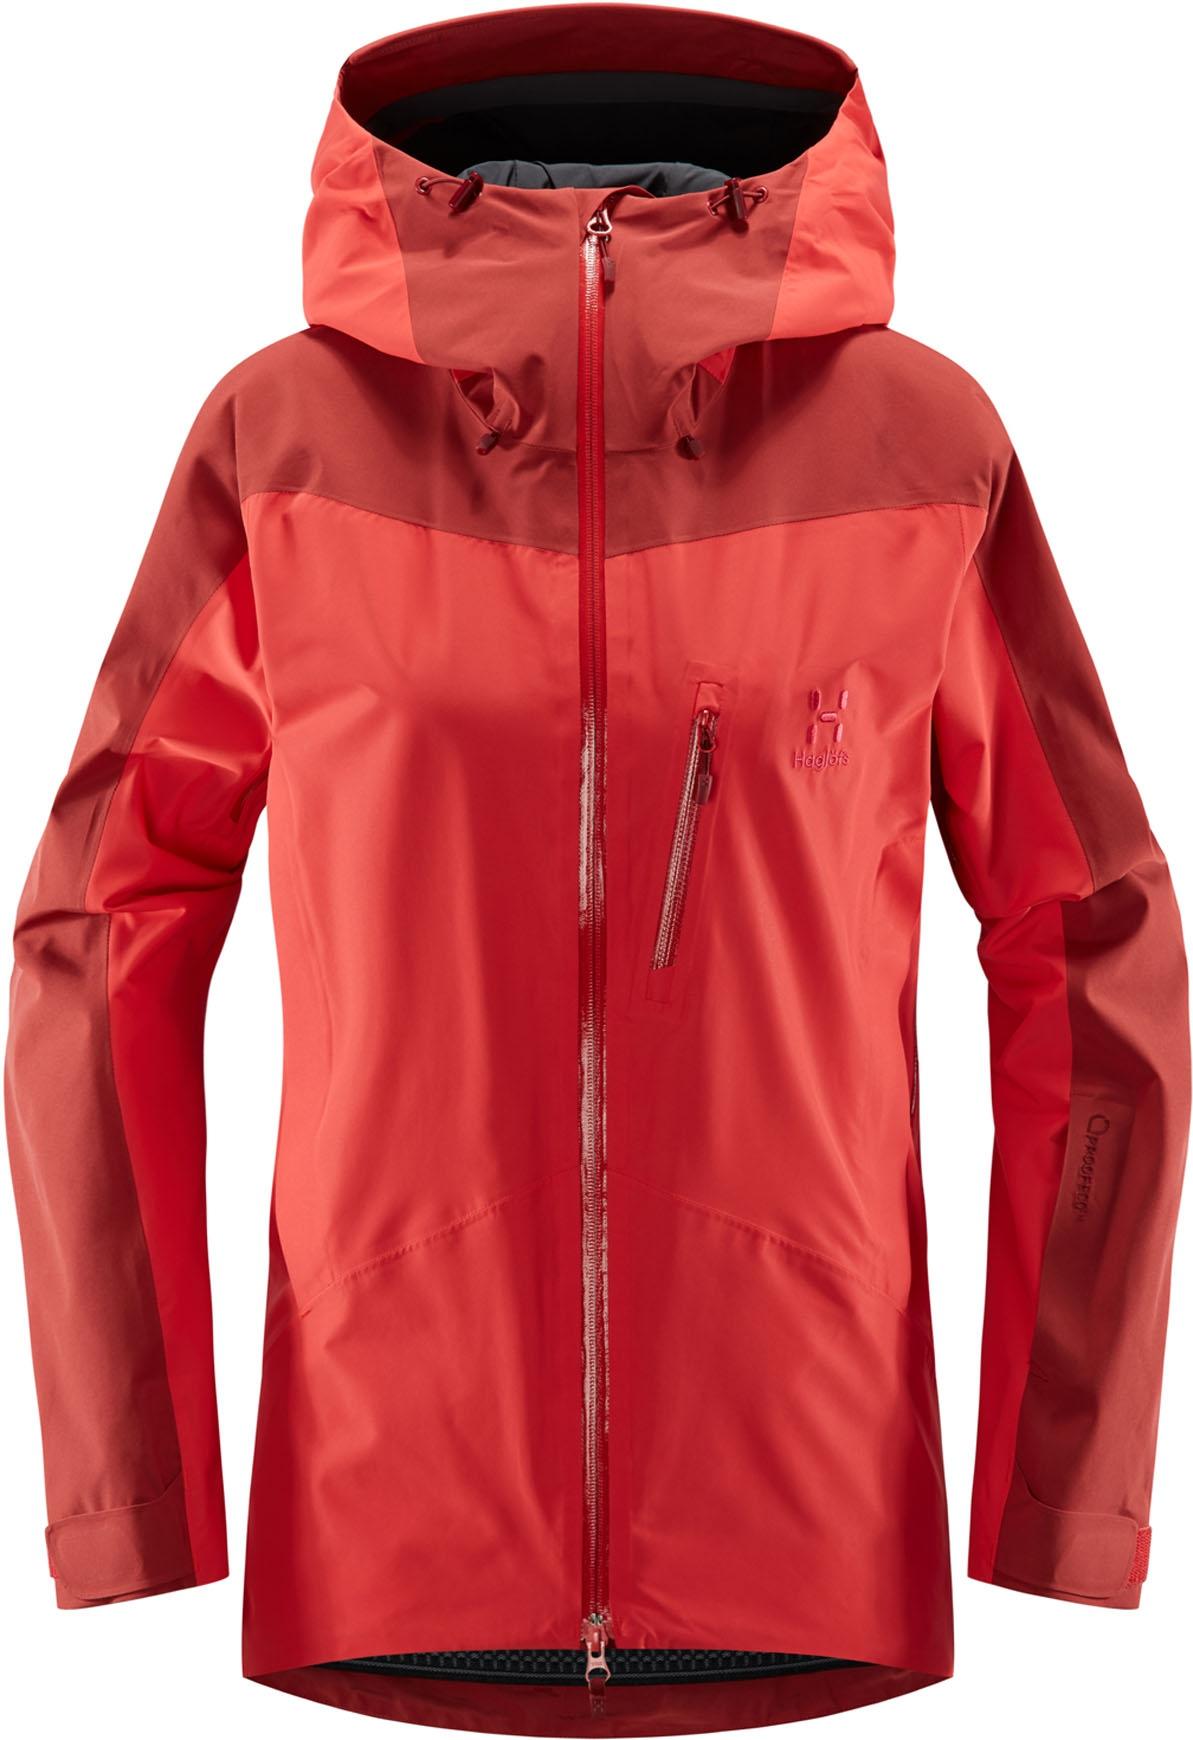 Niva Jacket Women Hibiscus RedBrick Red